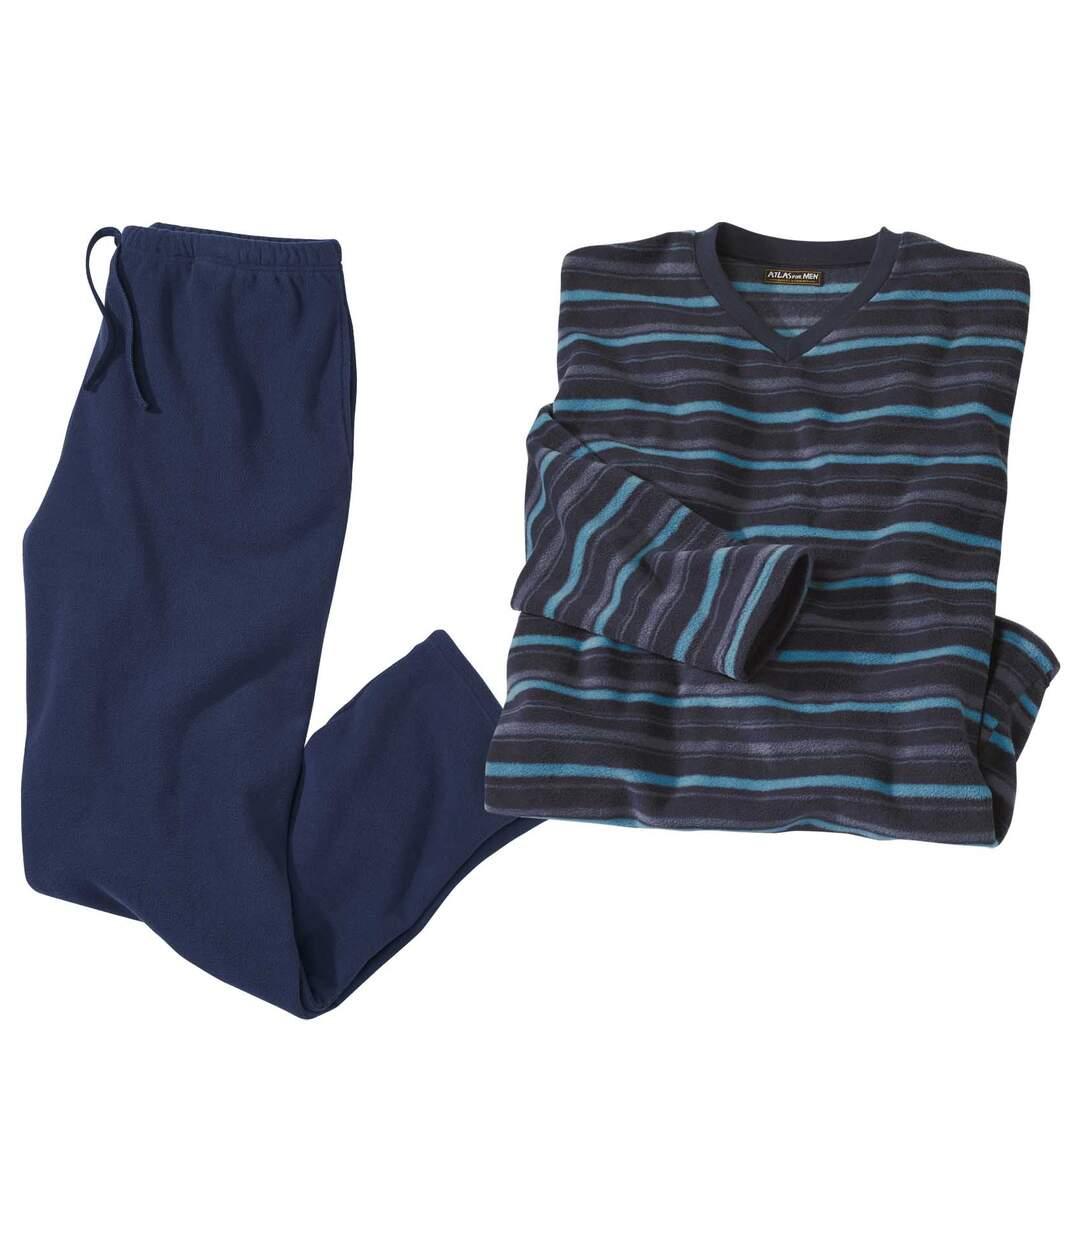 Men's Navy Blue Striped Microfleece Pyjamas